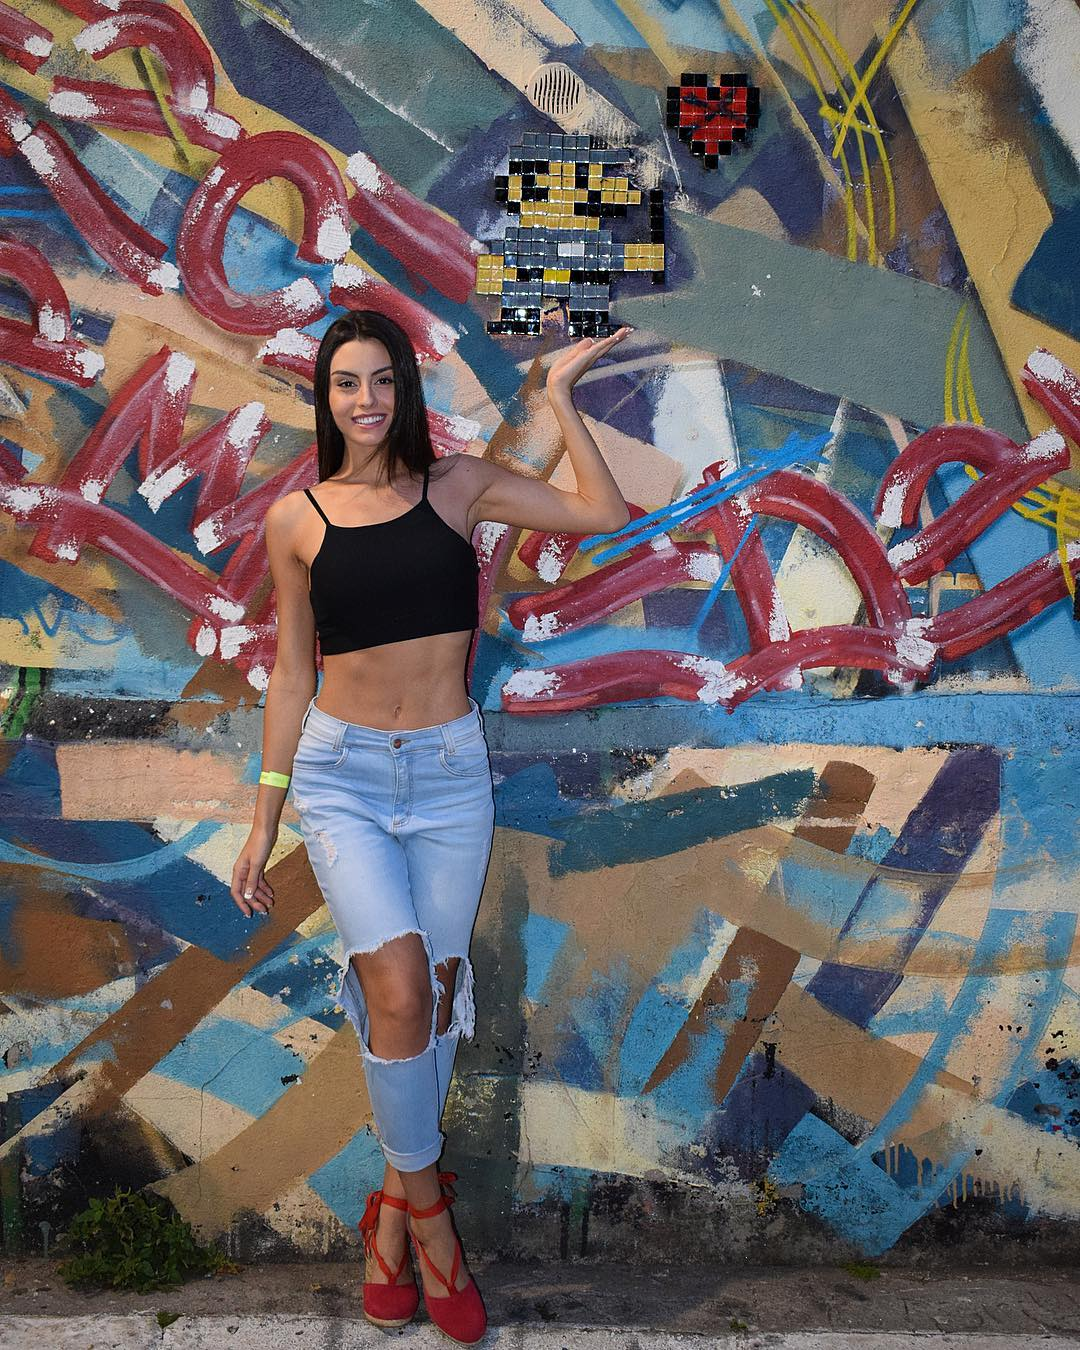 marjorie marcelle, top 5 de miss grand international 2019. - Página 2 41270710